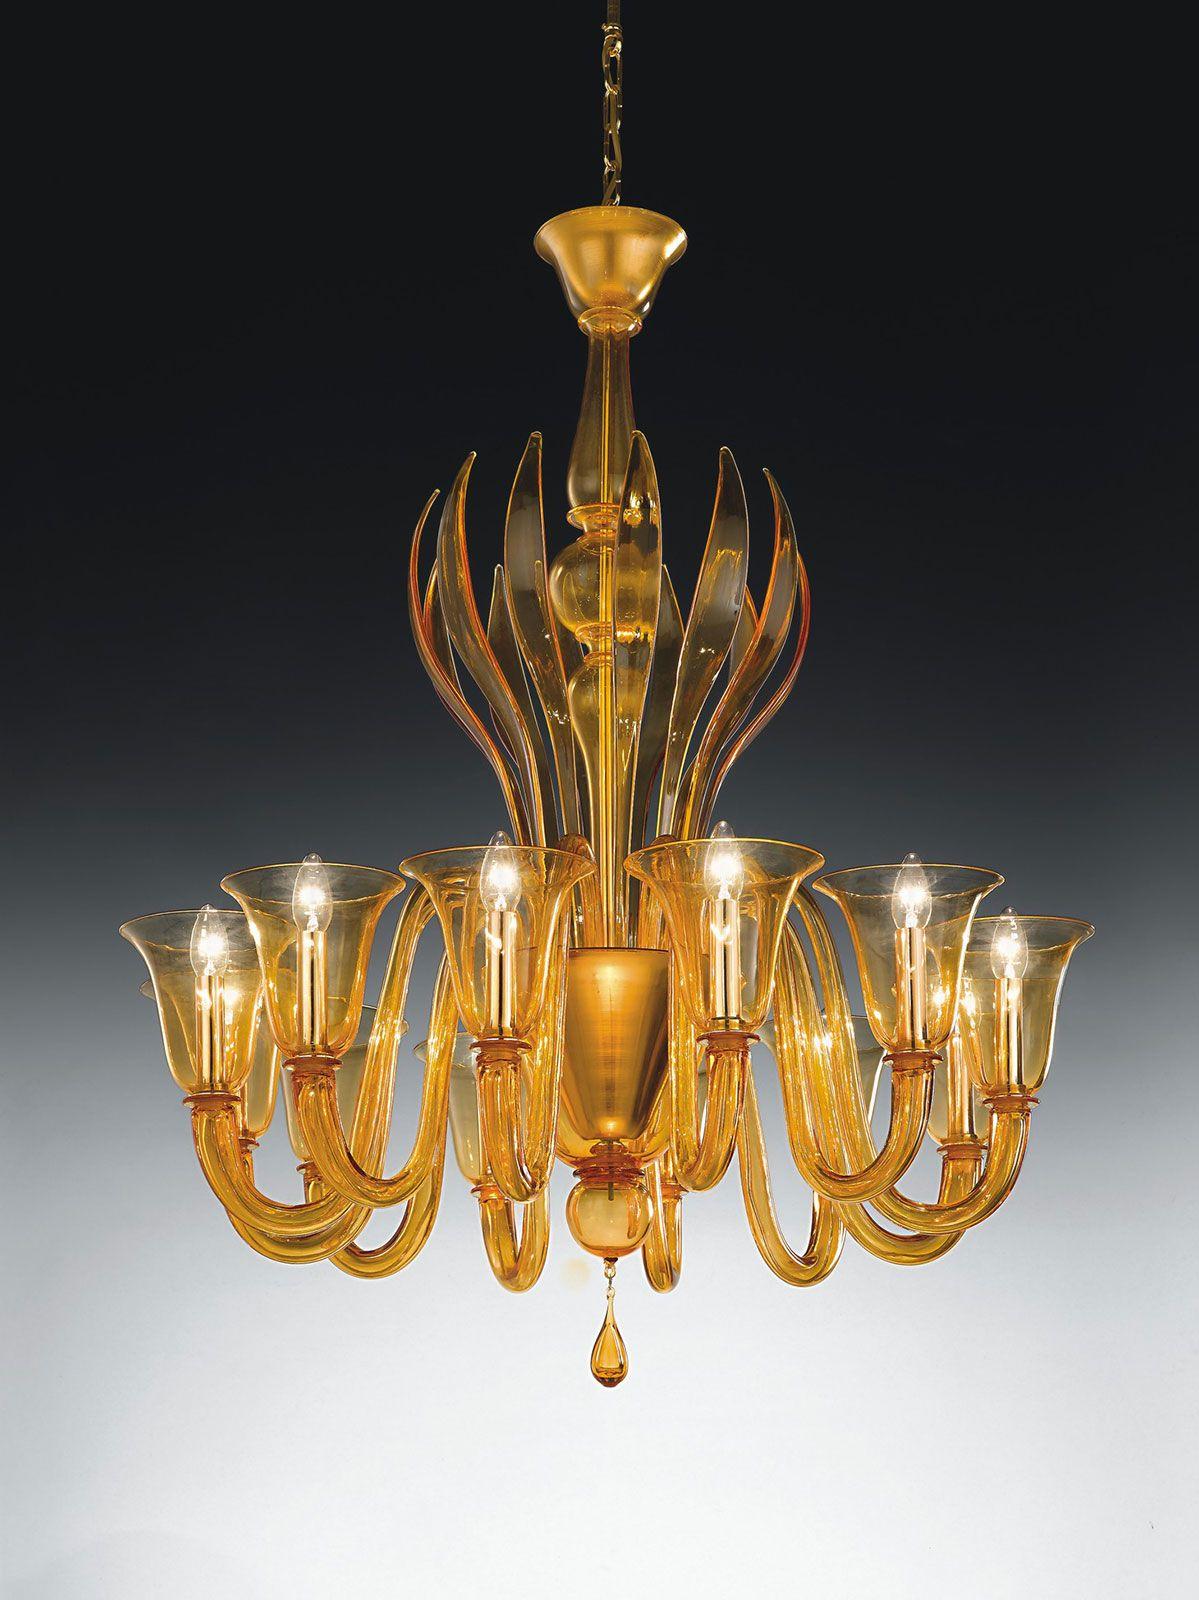 Doge-12 L Murano glass pendant light | Glass pendant light ...